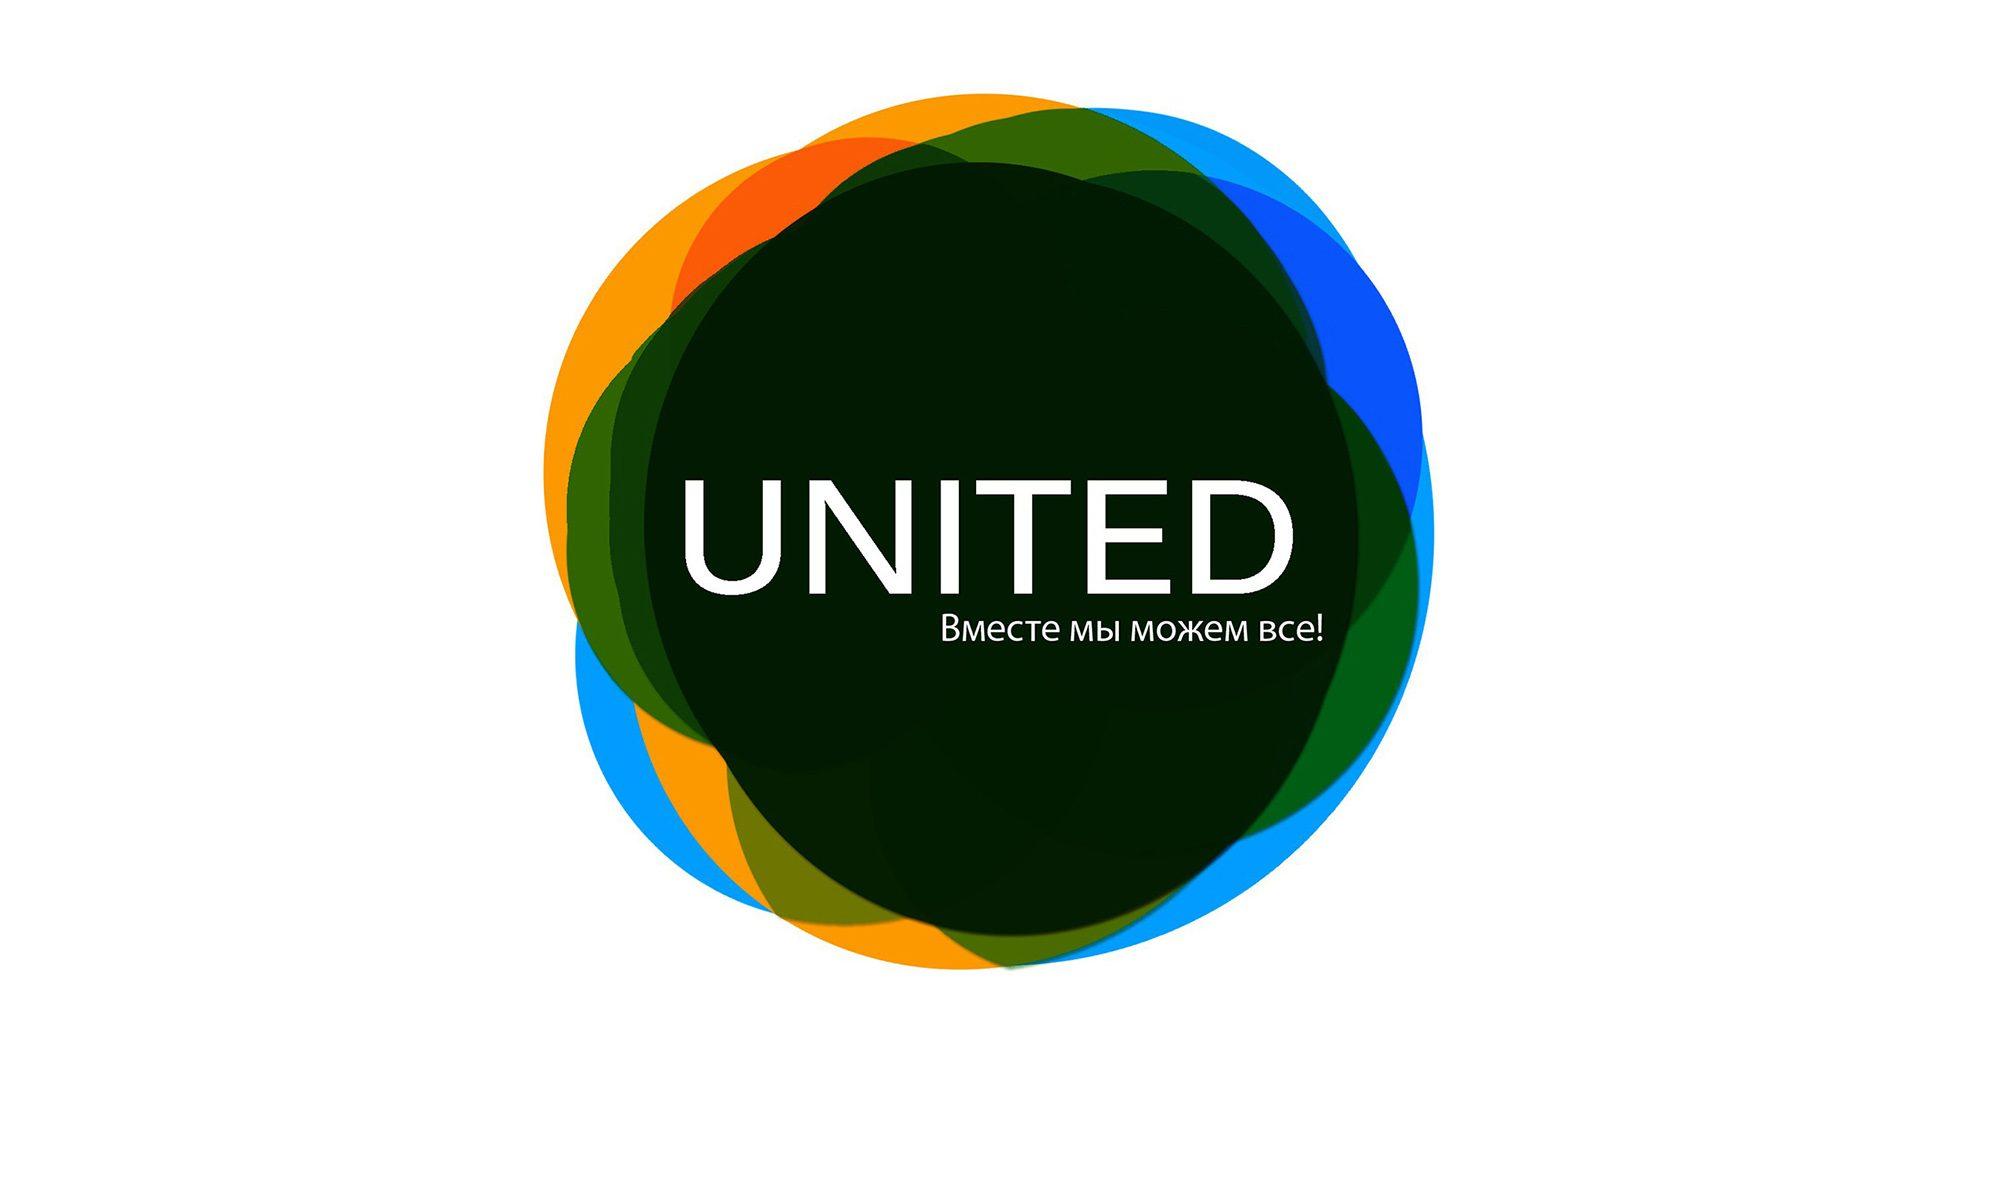 United 4 me